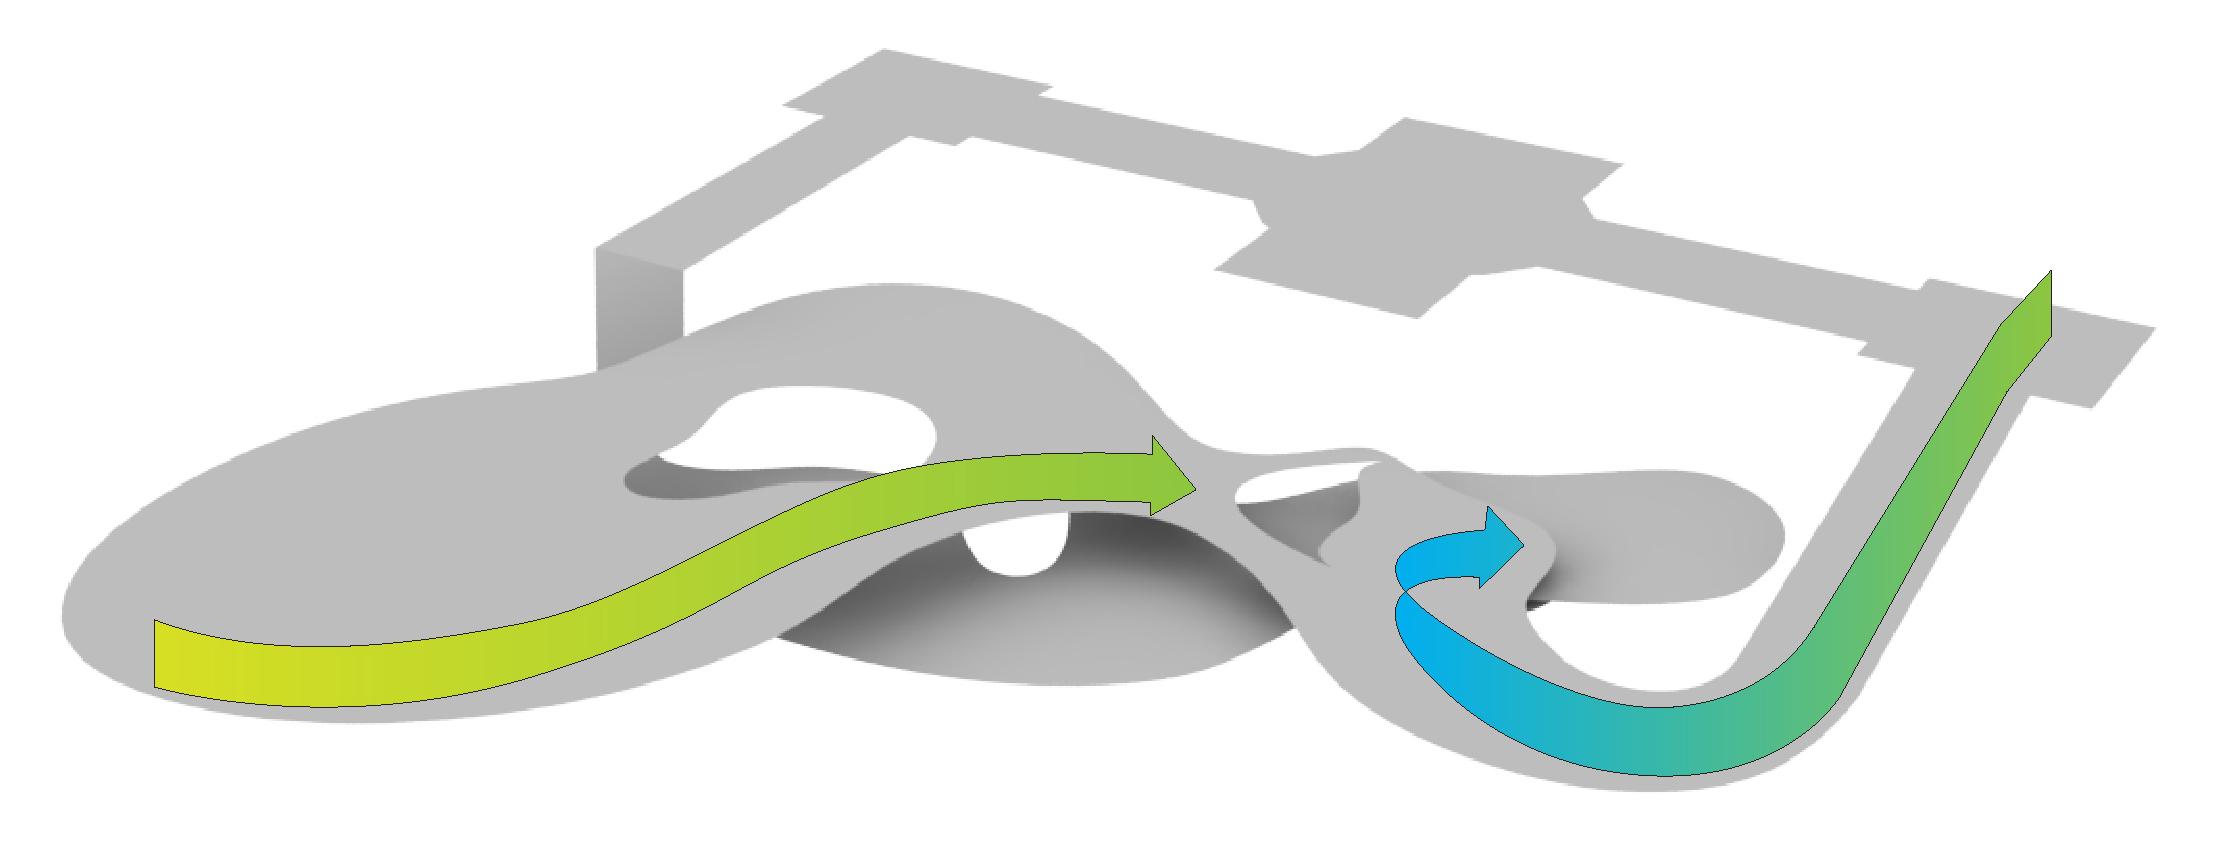 circulation 2.jpg